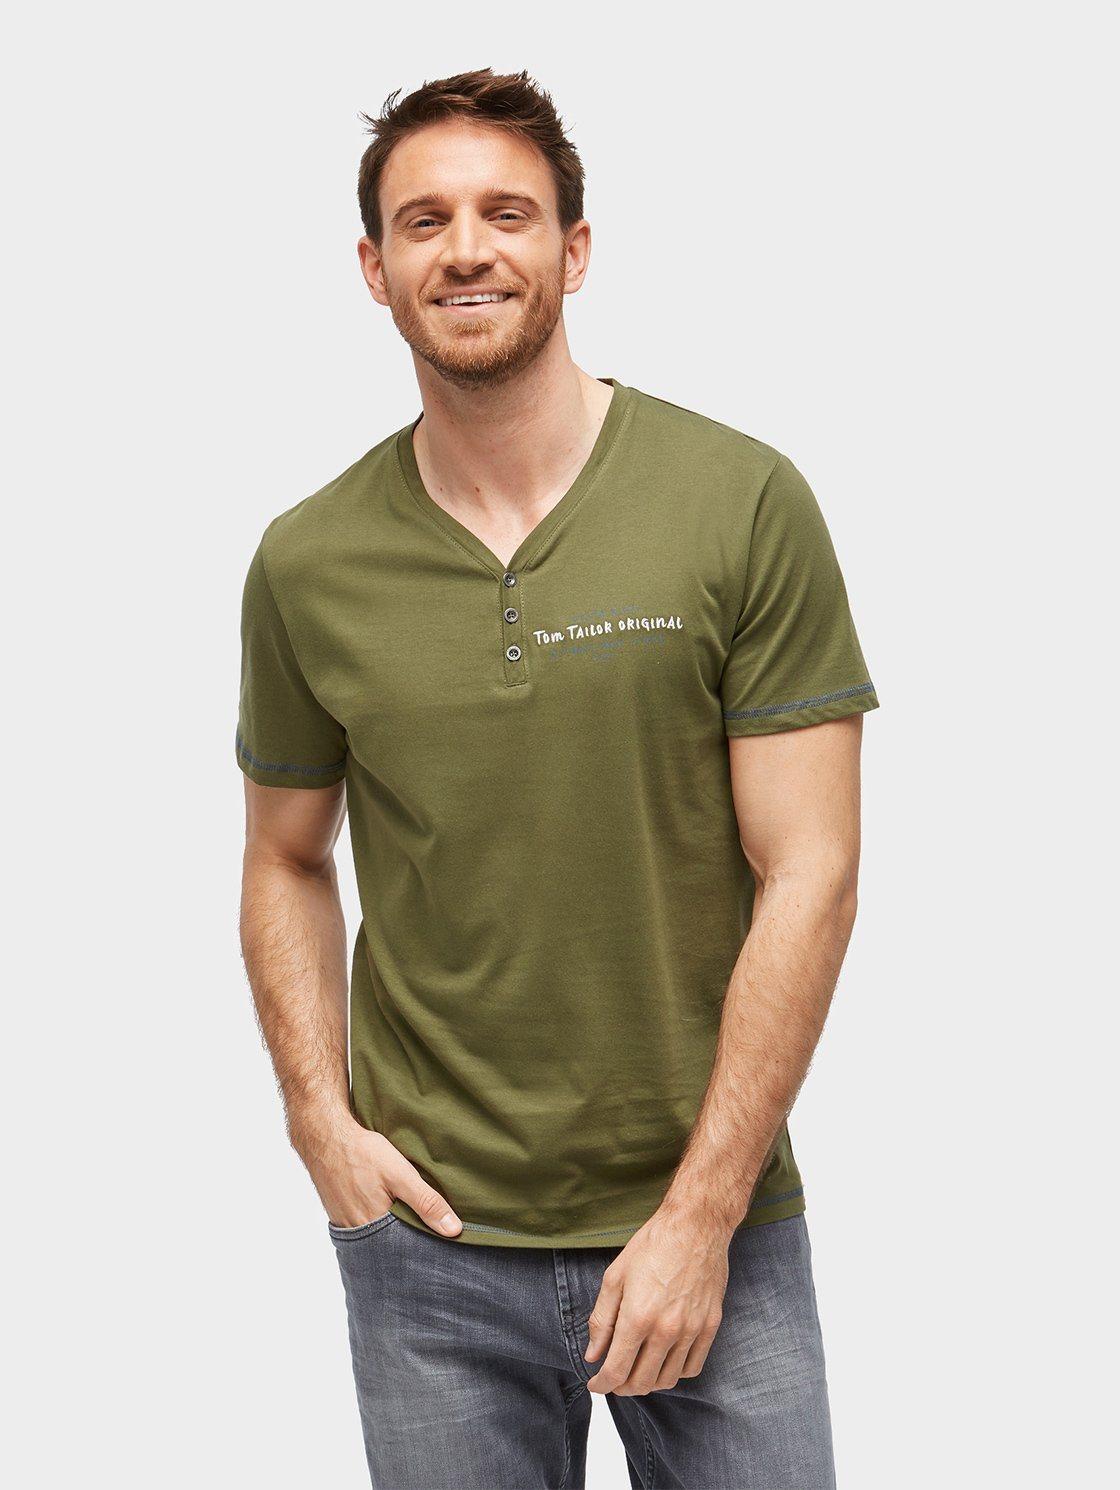 TOM TAILOR T-Shirt »T-Shirt mit Schrift-Stickerei«   Bekleidung > Shirts > Sonstige Shirts   TOM TAILOR